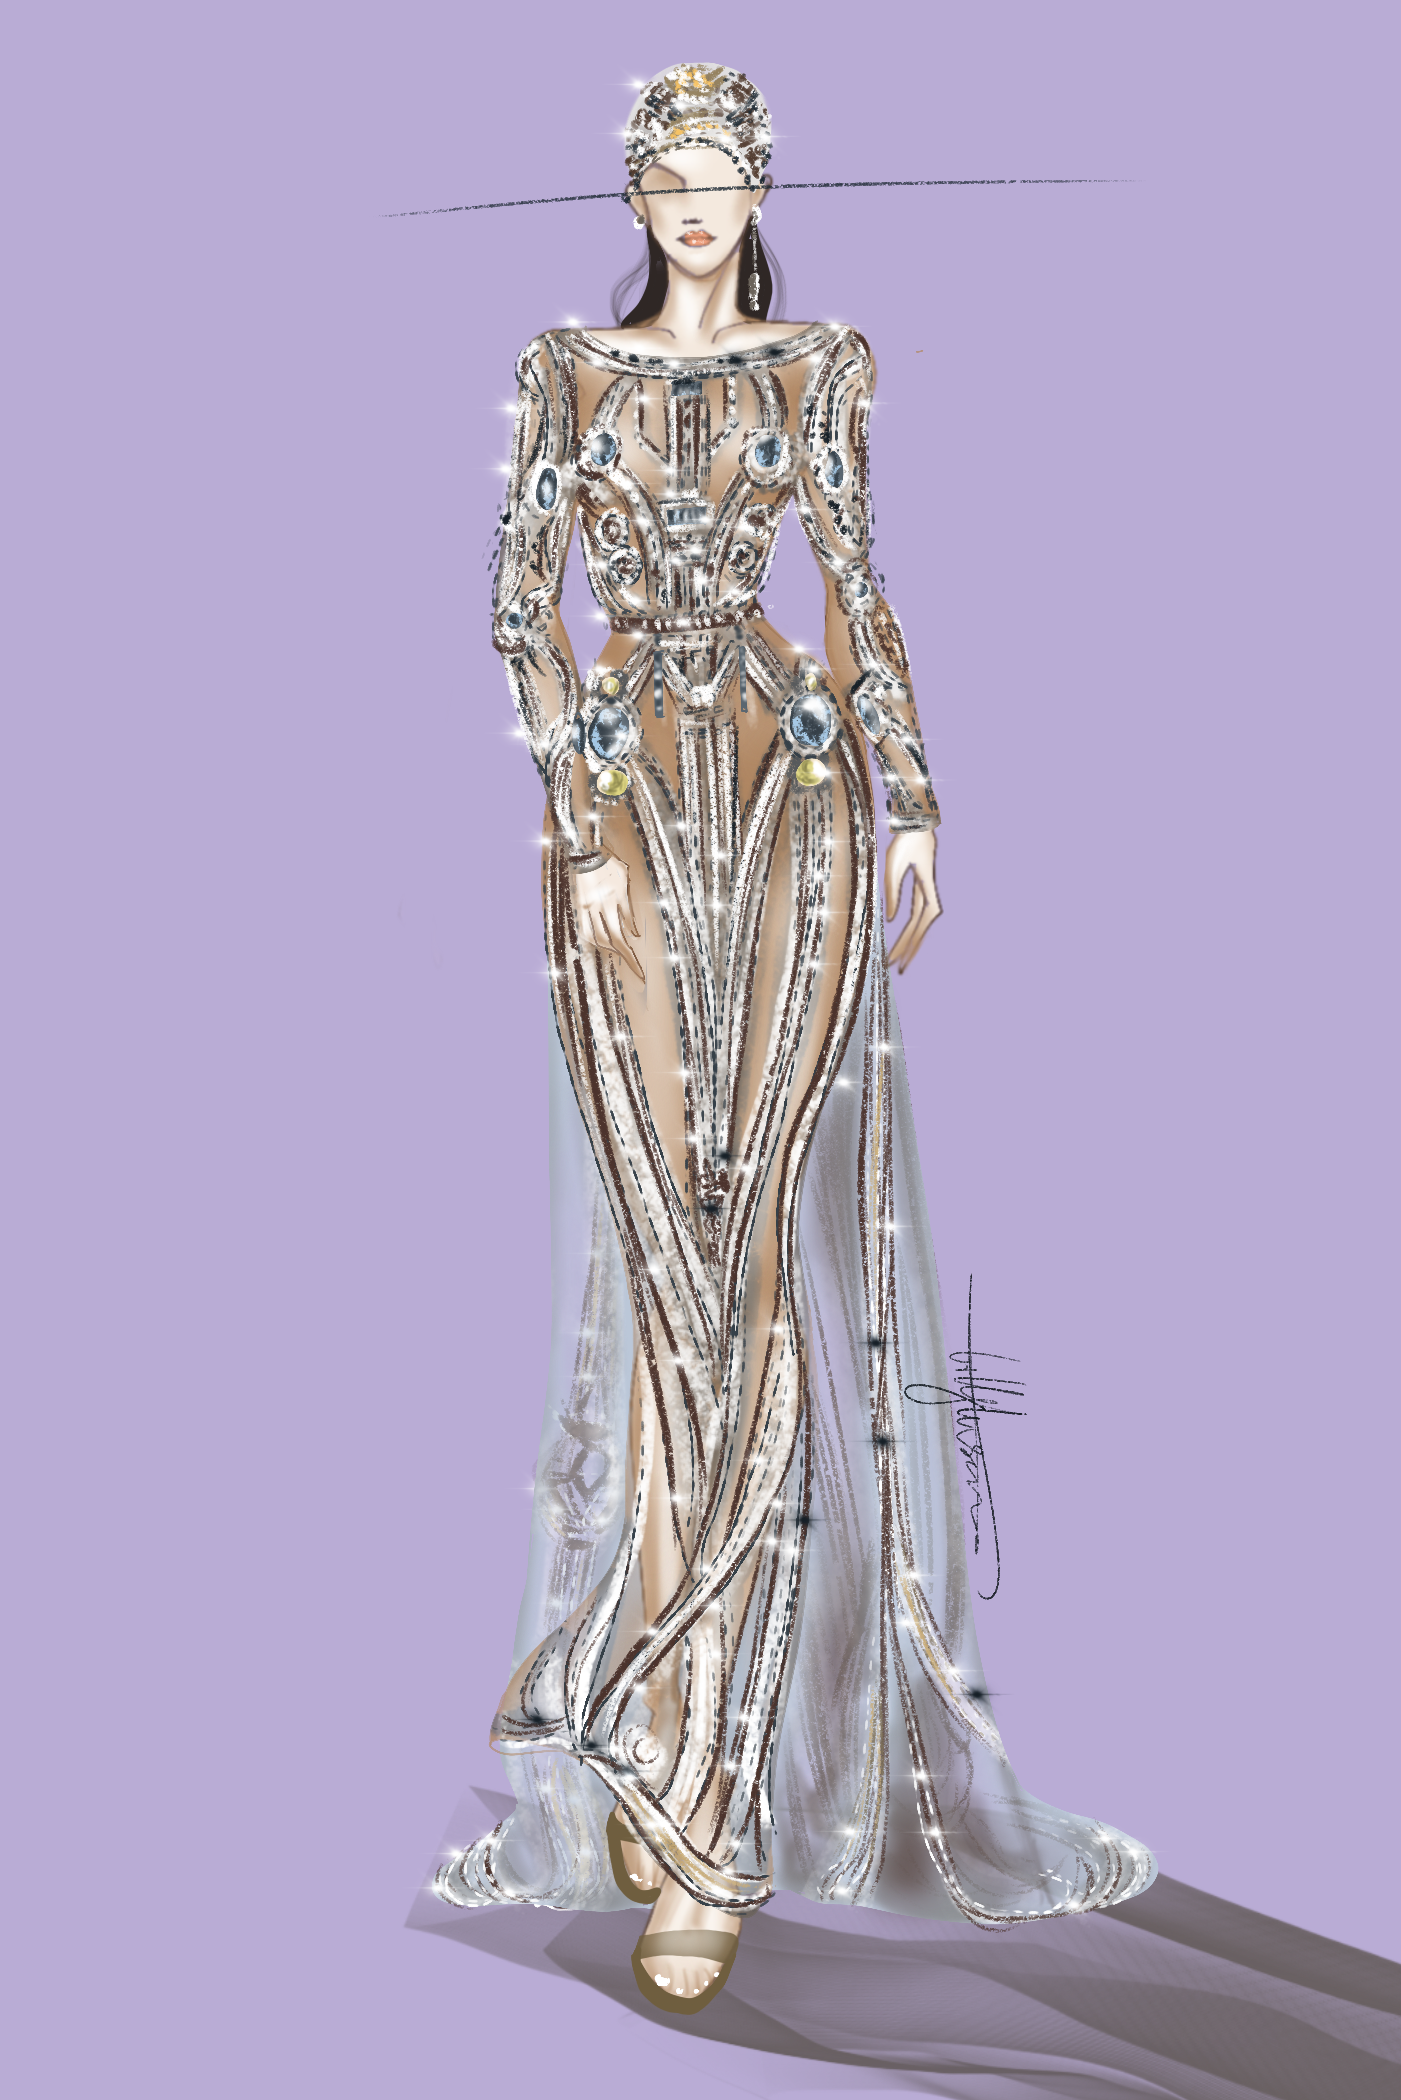 Digital Fashion Illustration Of Couture Dress In 2020 Digital Fashion Illustration Fashion Illustration Fashion